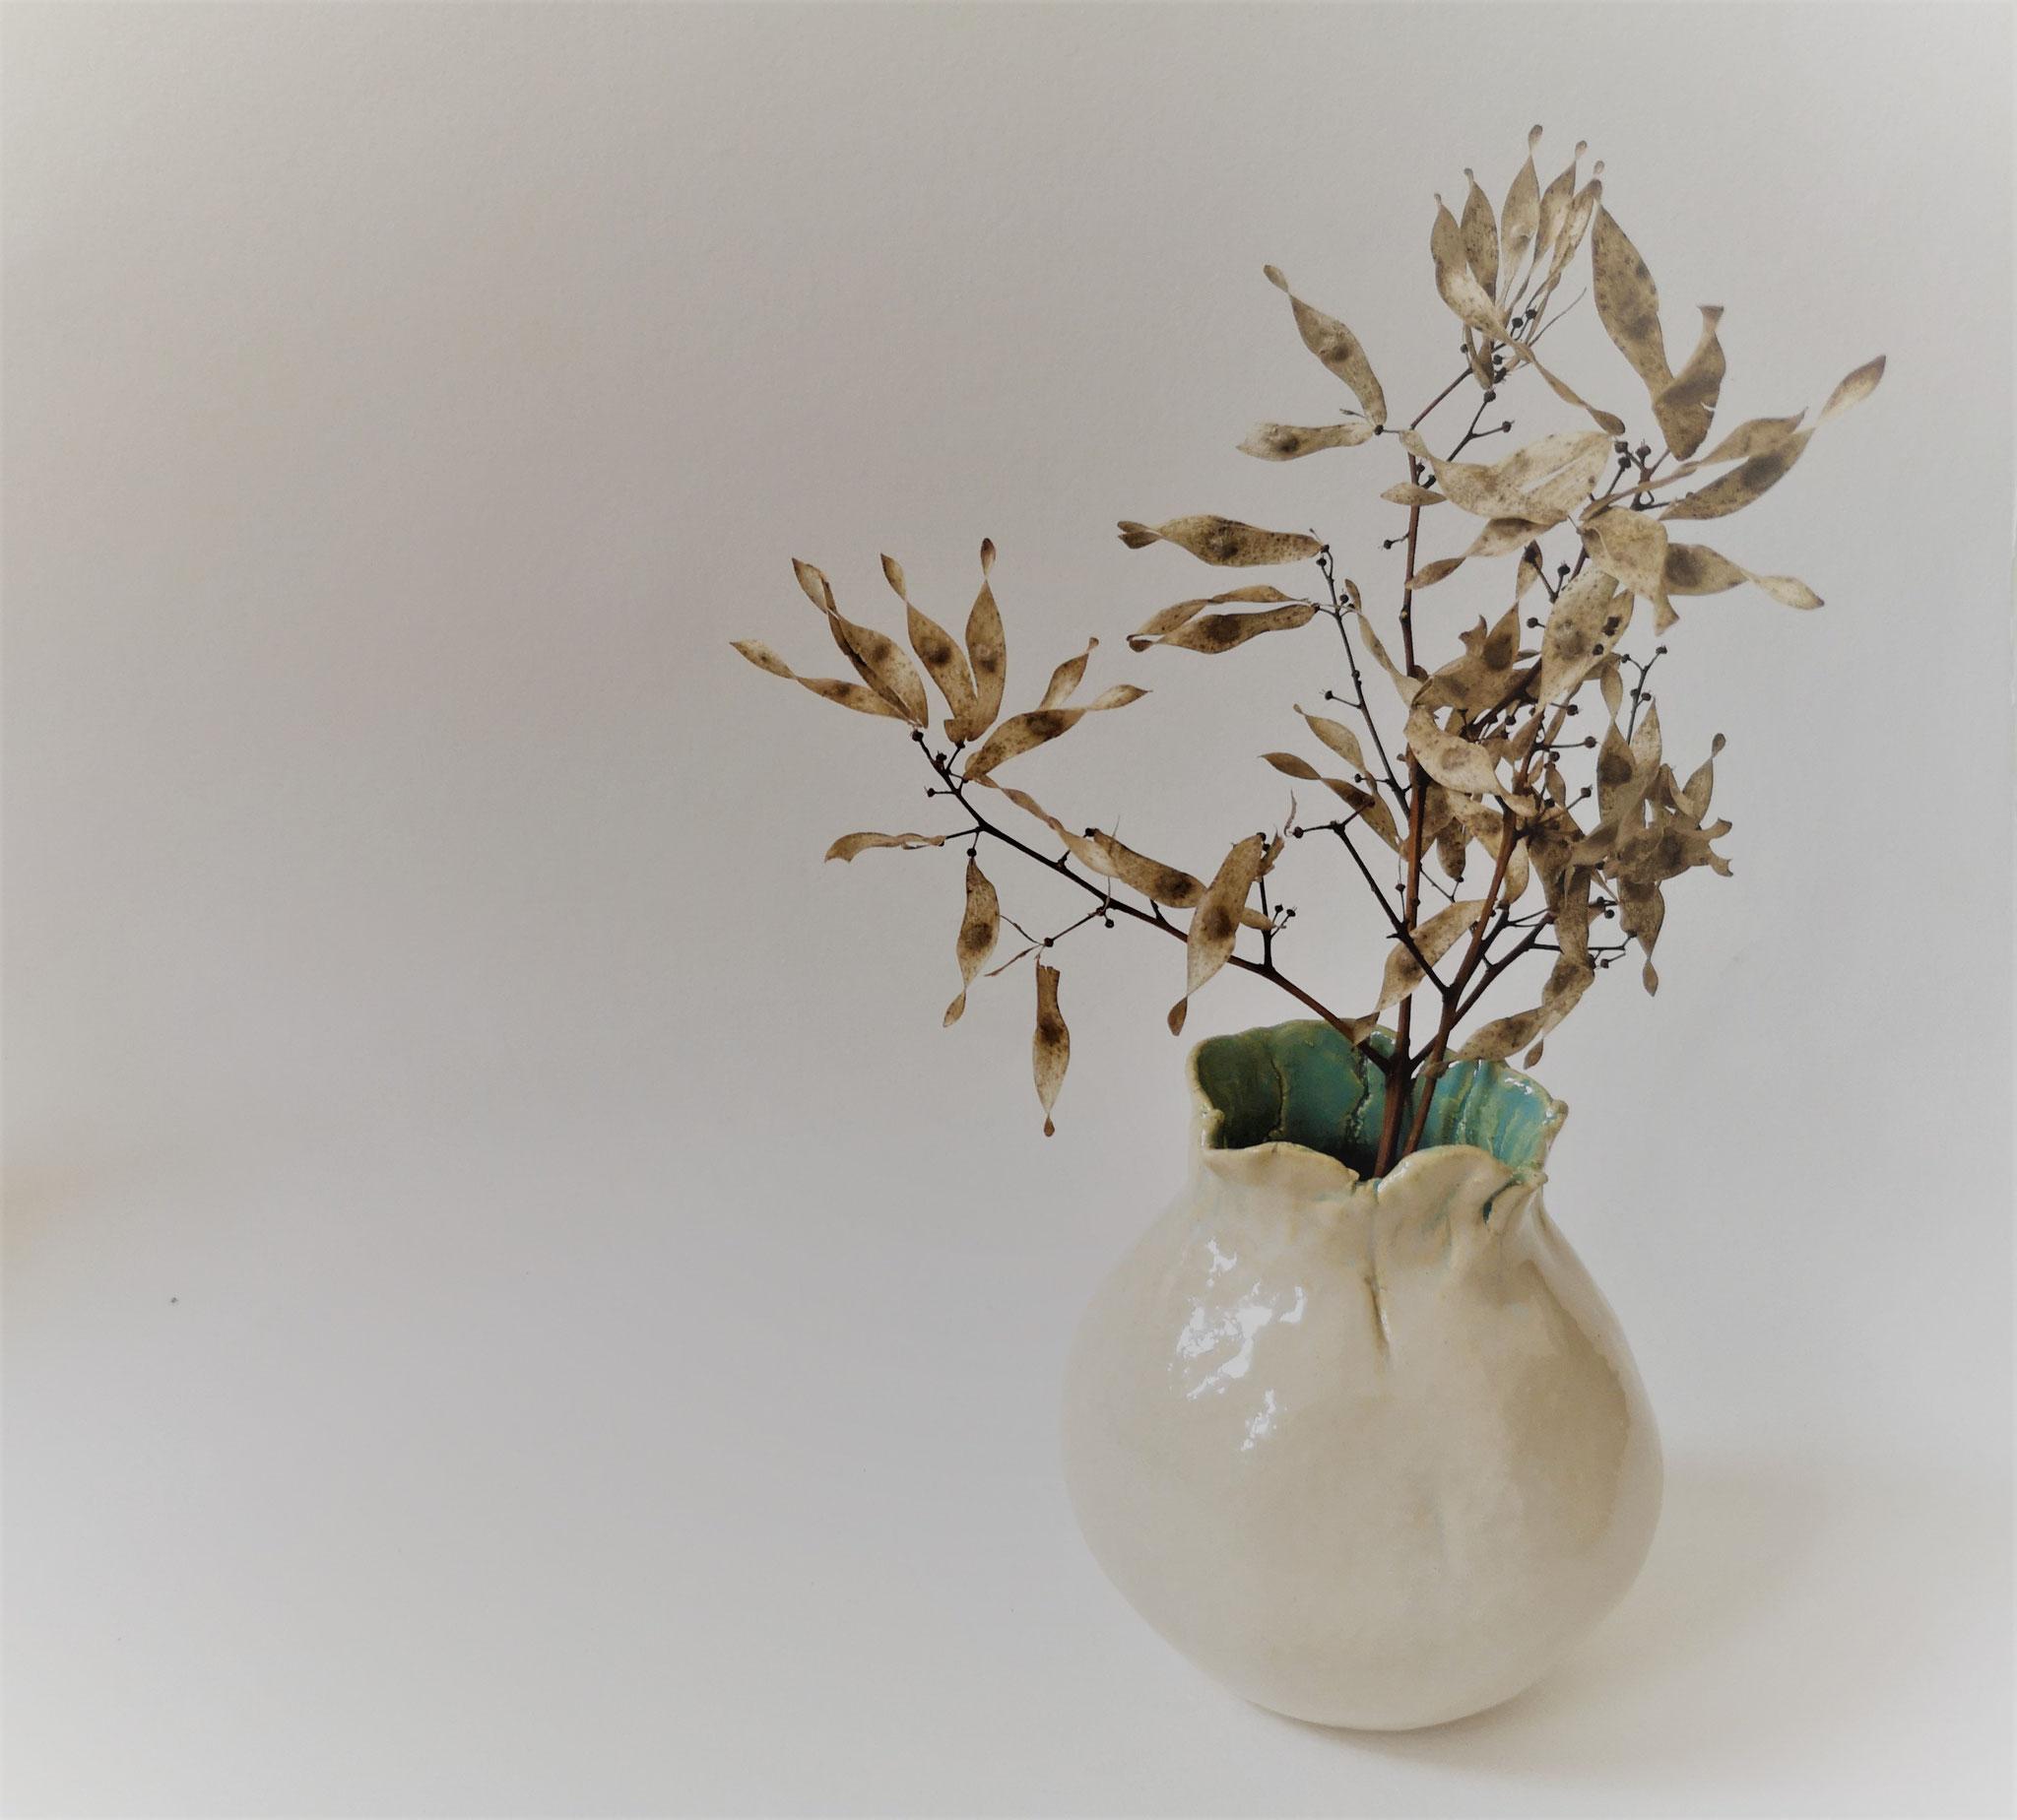 (c) Doris Strade, 2019, Keramikgefäß